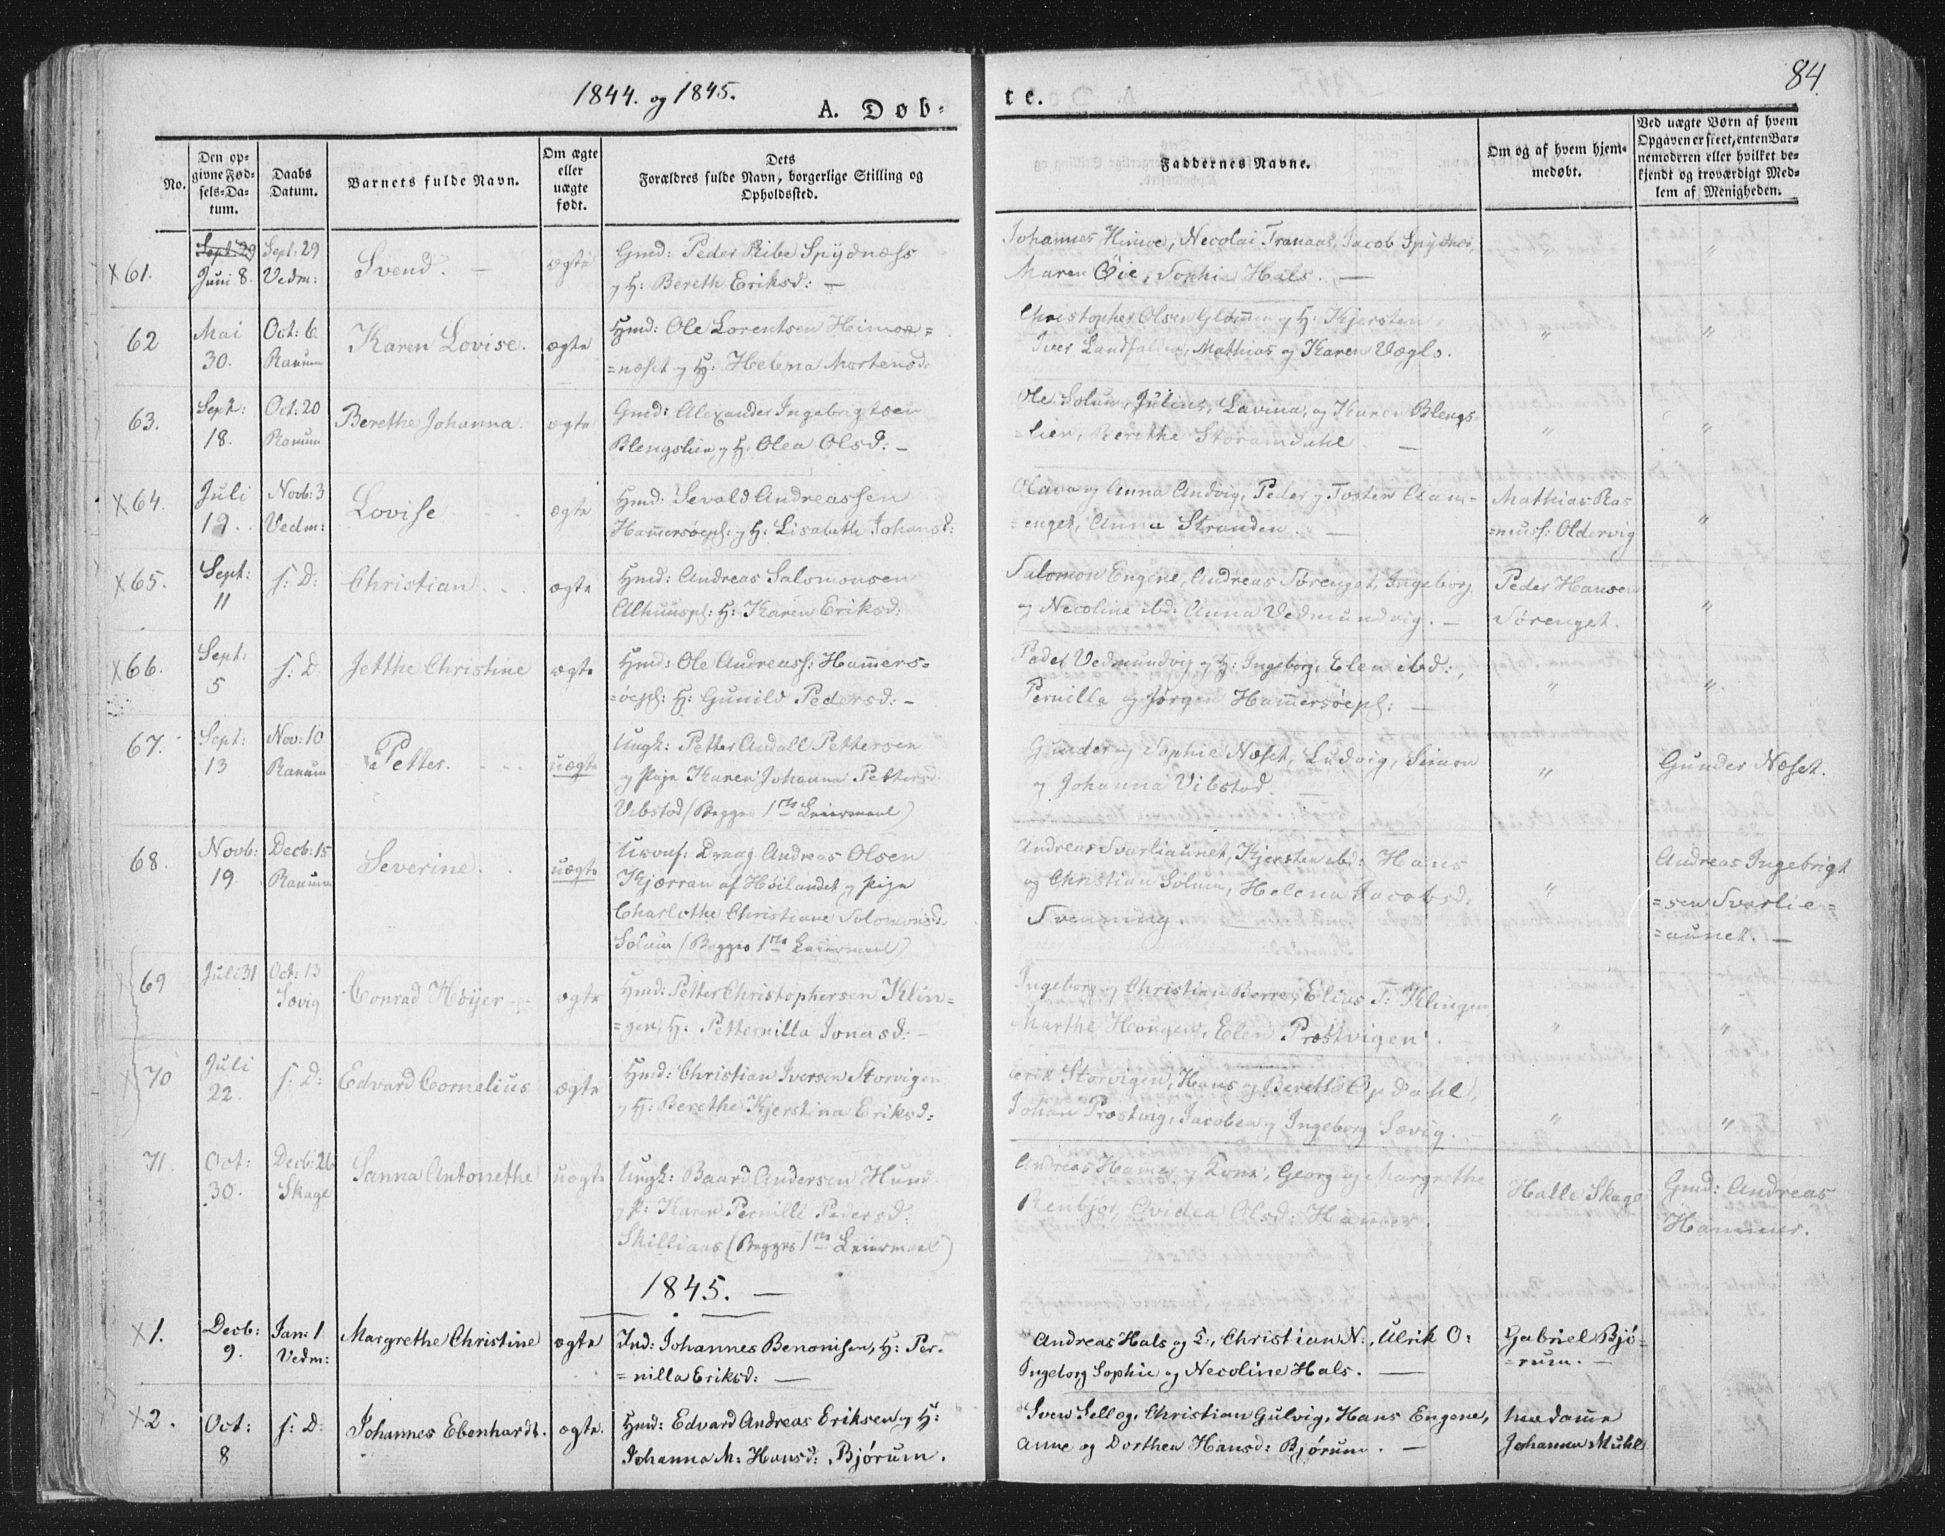 SAT, Ministerialprotokoller, klokkerbøker og fødselsregistre - Nord-Trøndelag, 764/L0551: Ministerialbok nr. 764A07a, 1824-1864, s. 84